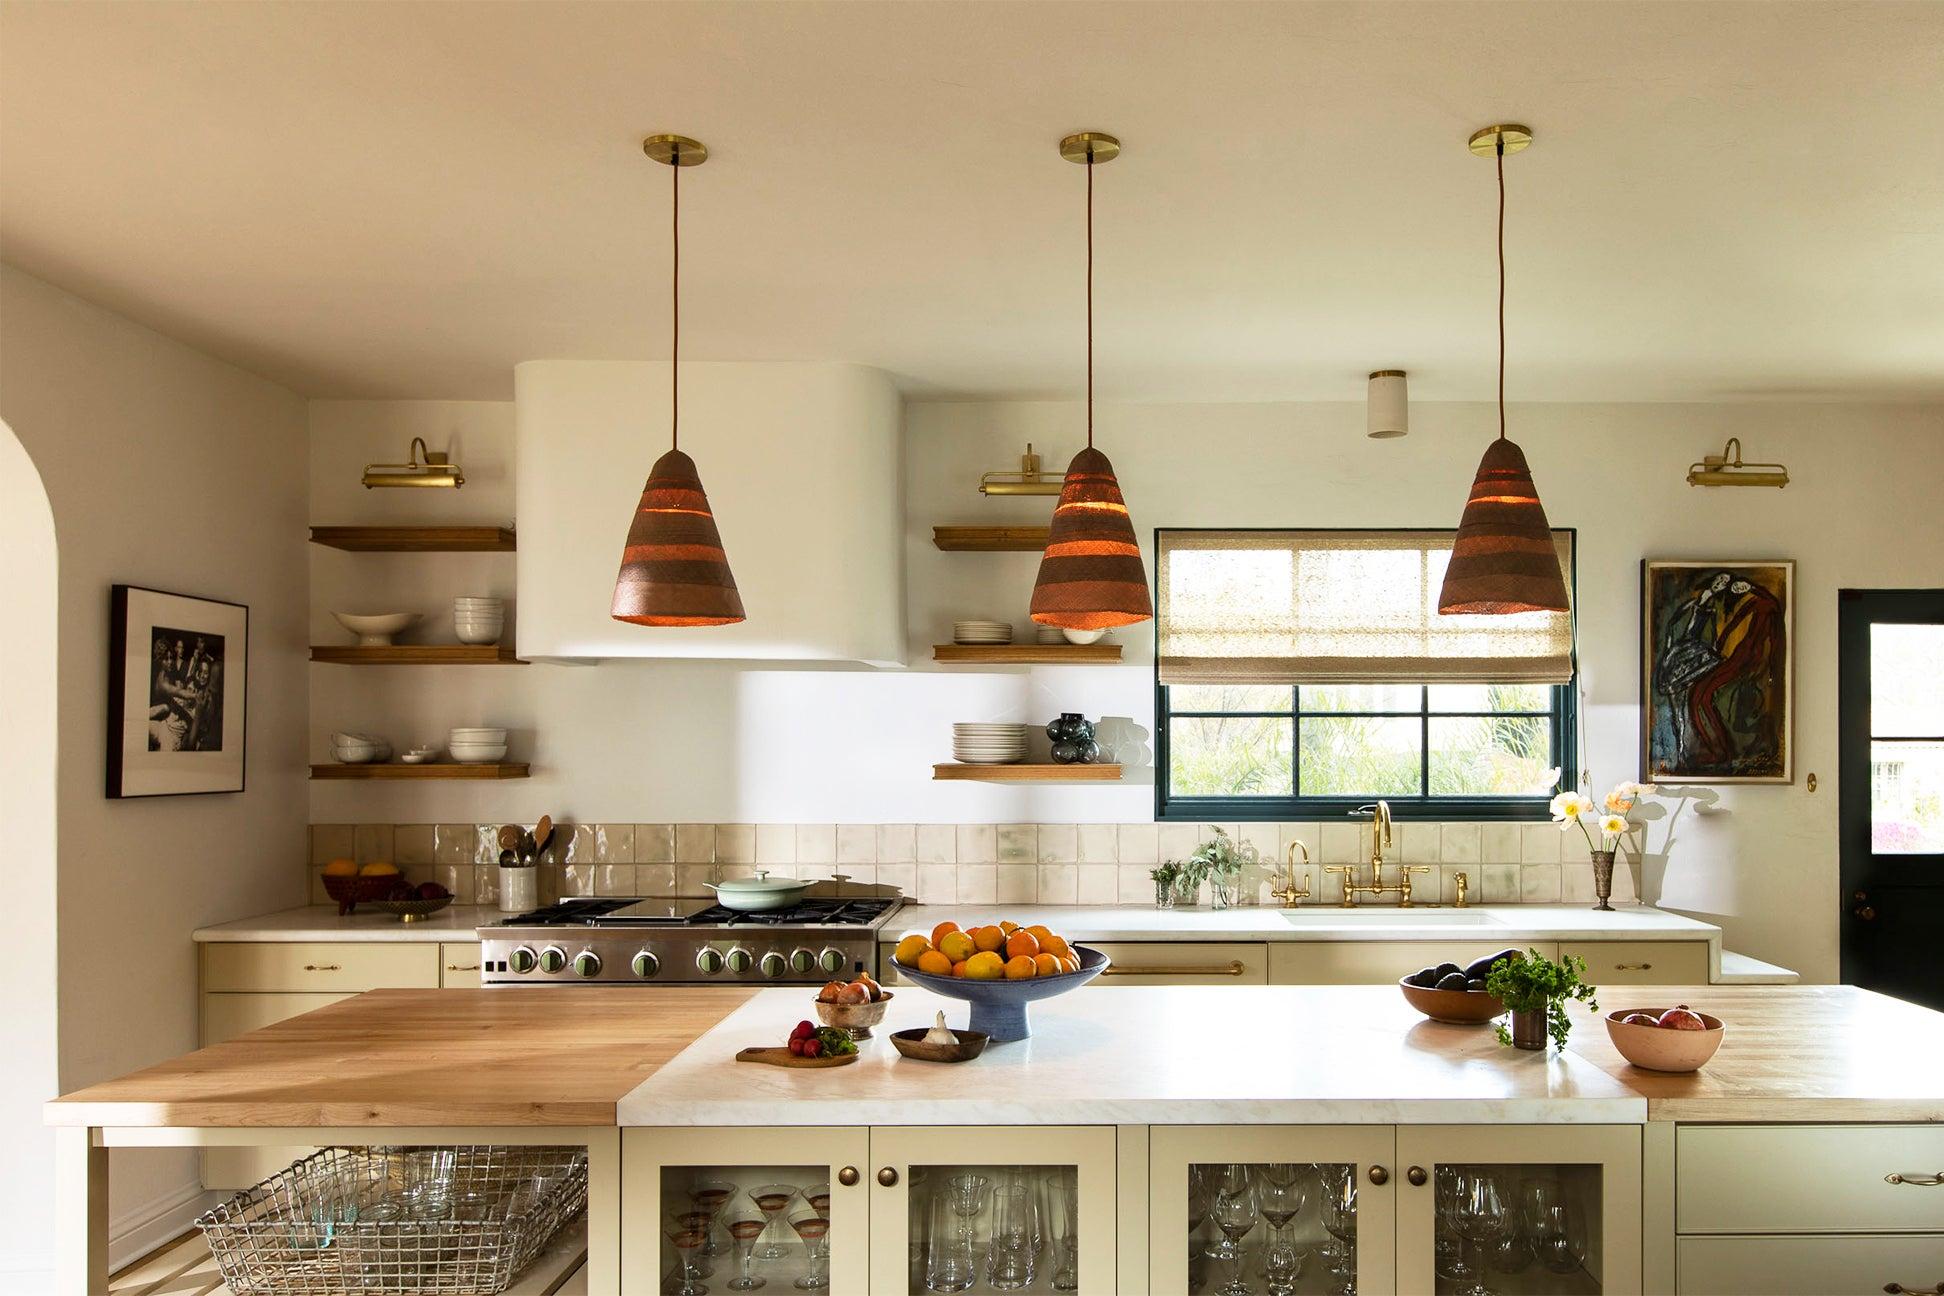 kitchen-counter-designer-mail-catch-all-domino